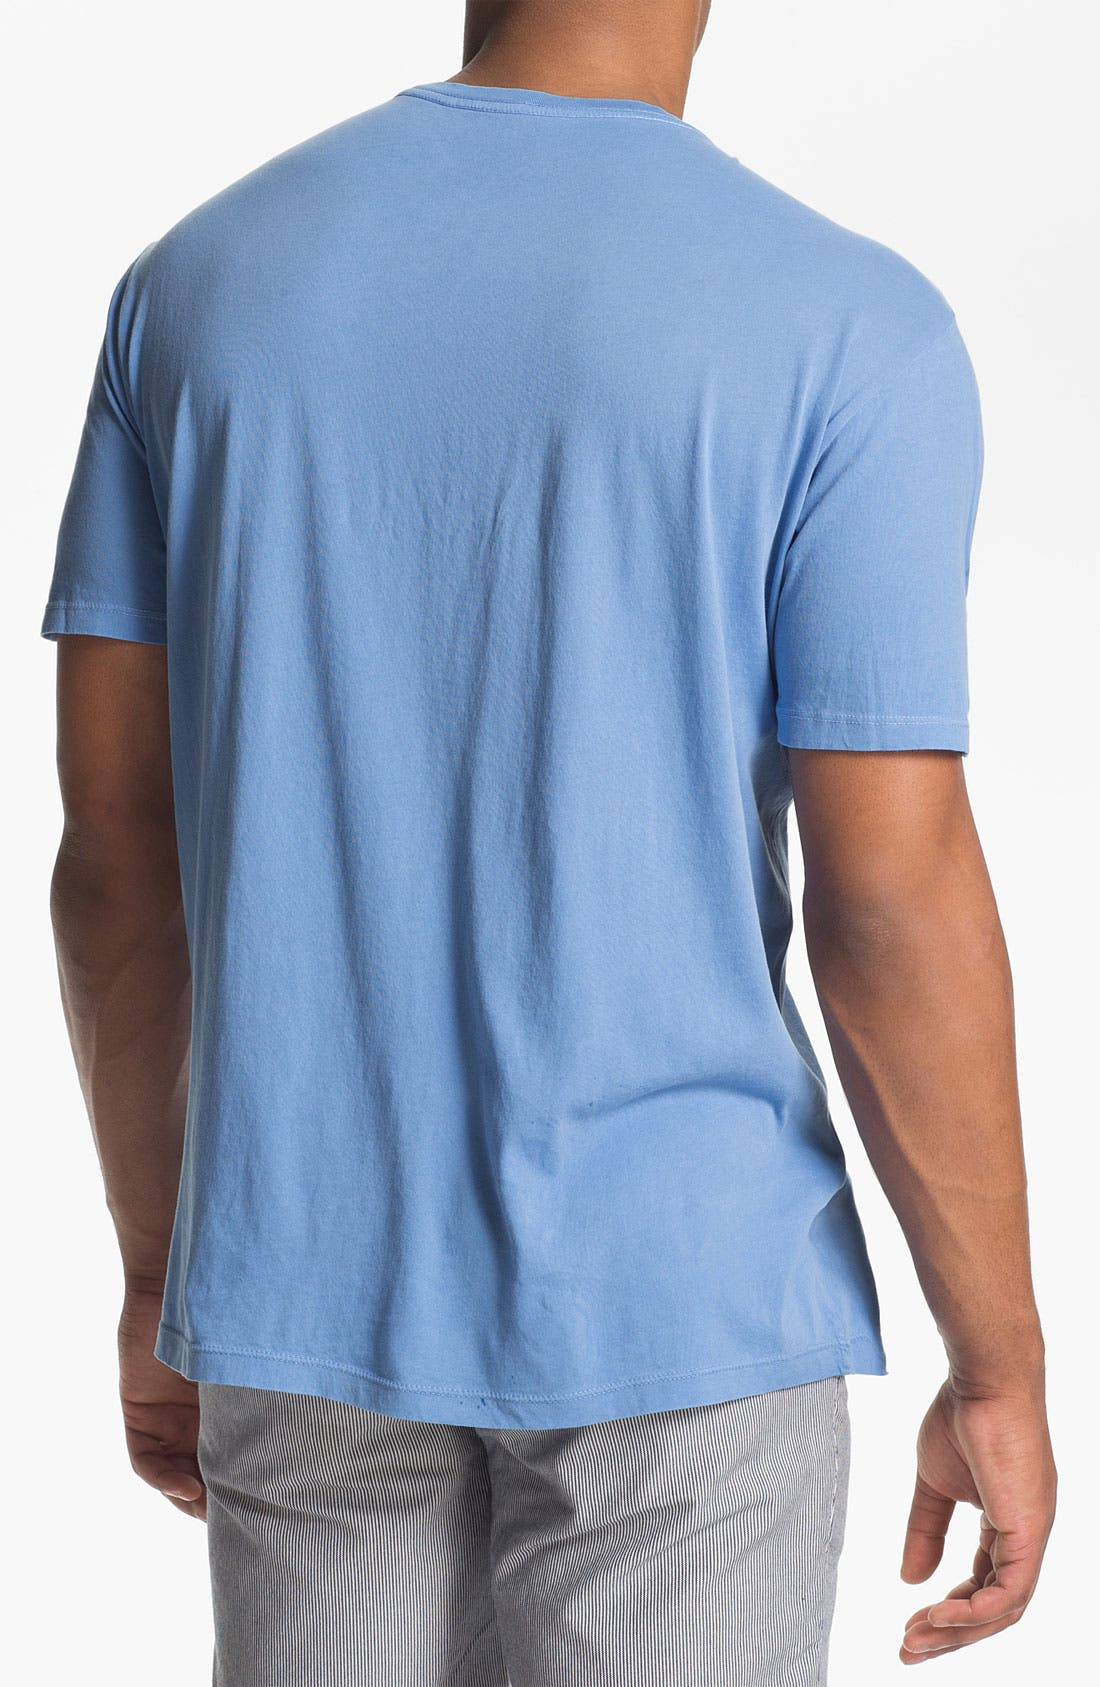 Alternate Image 2  - Wallin & Bros. Trim Fit Crewneck T-Shirt